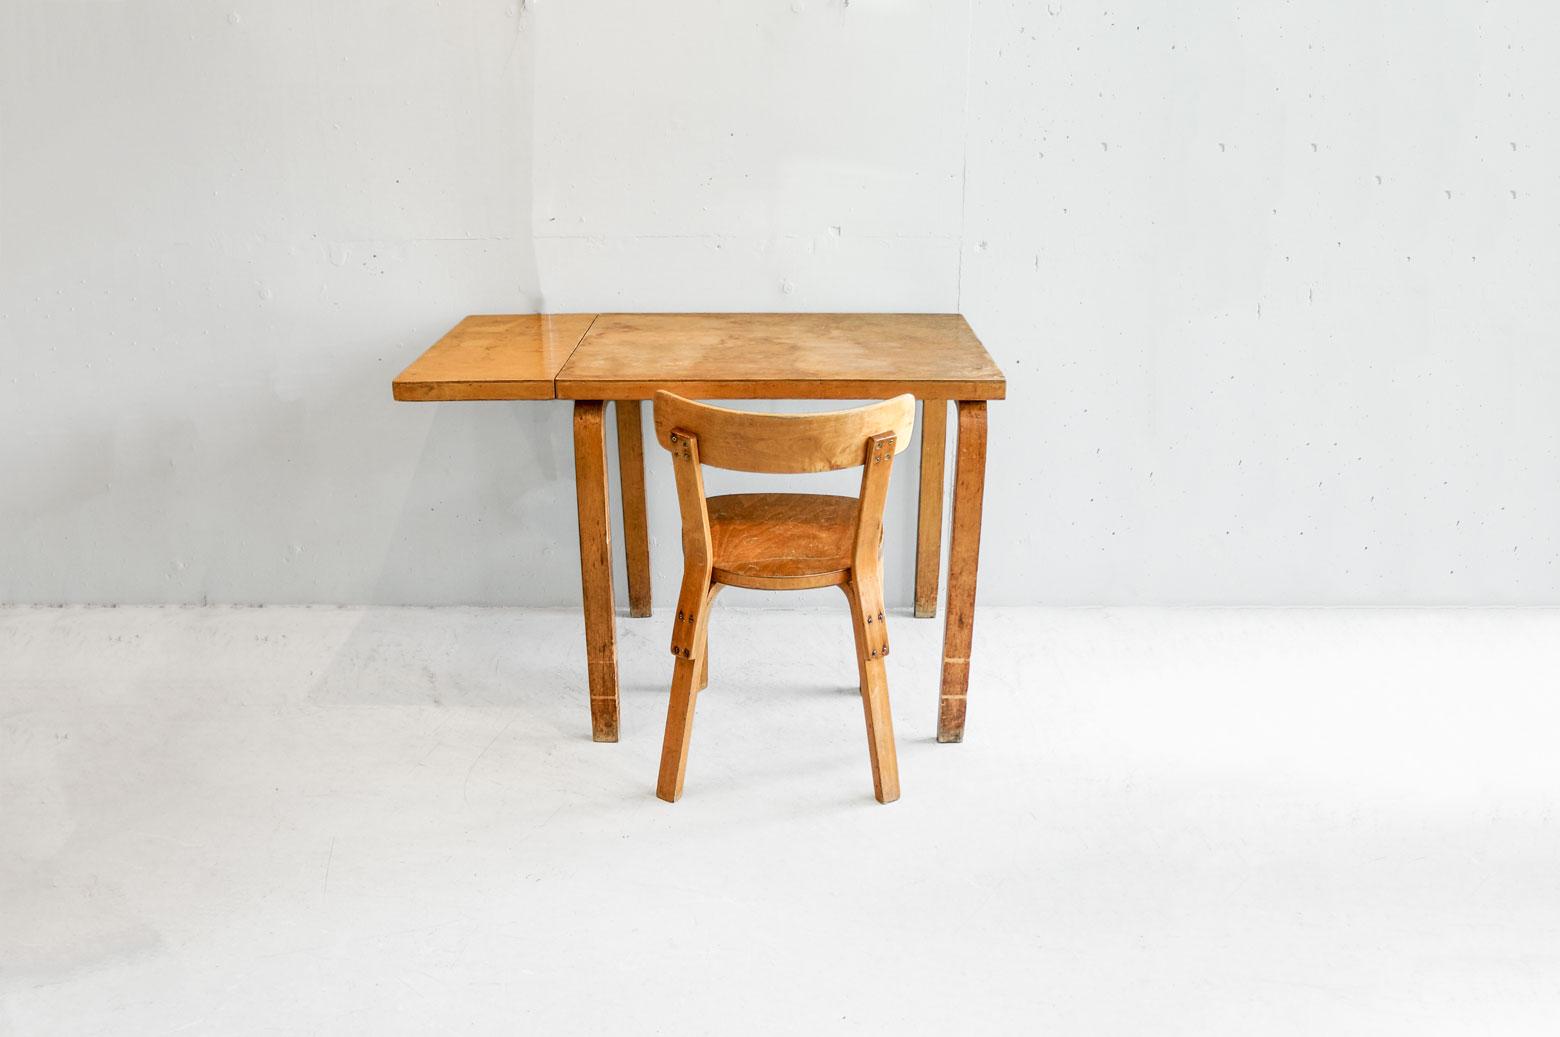 Vintage artek Alvar Aalto Extension Table Chair No.69 set/ヴィンテージ アルテック アルヴァ・アアルト エクステンション テーブル チェアNo.69 セット